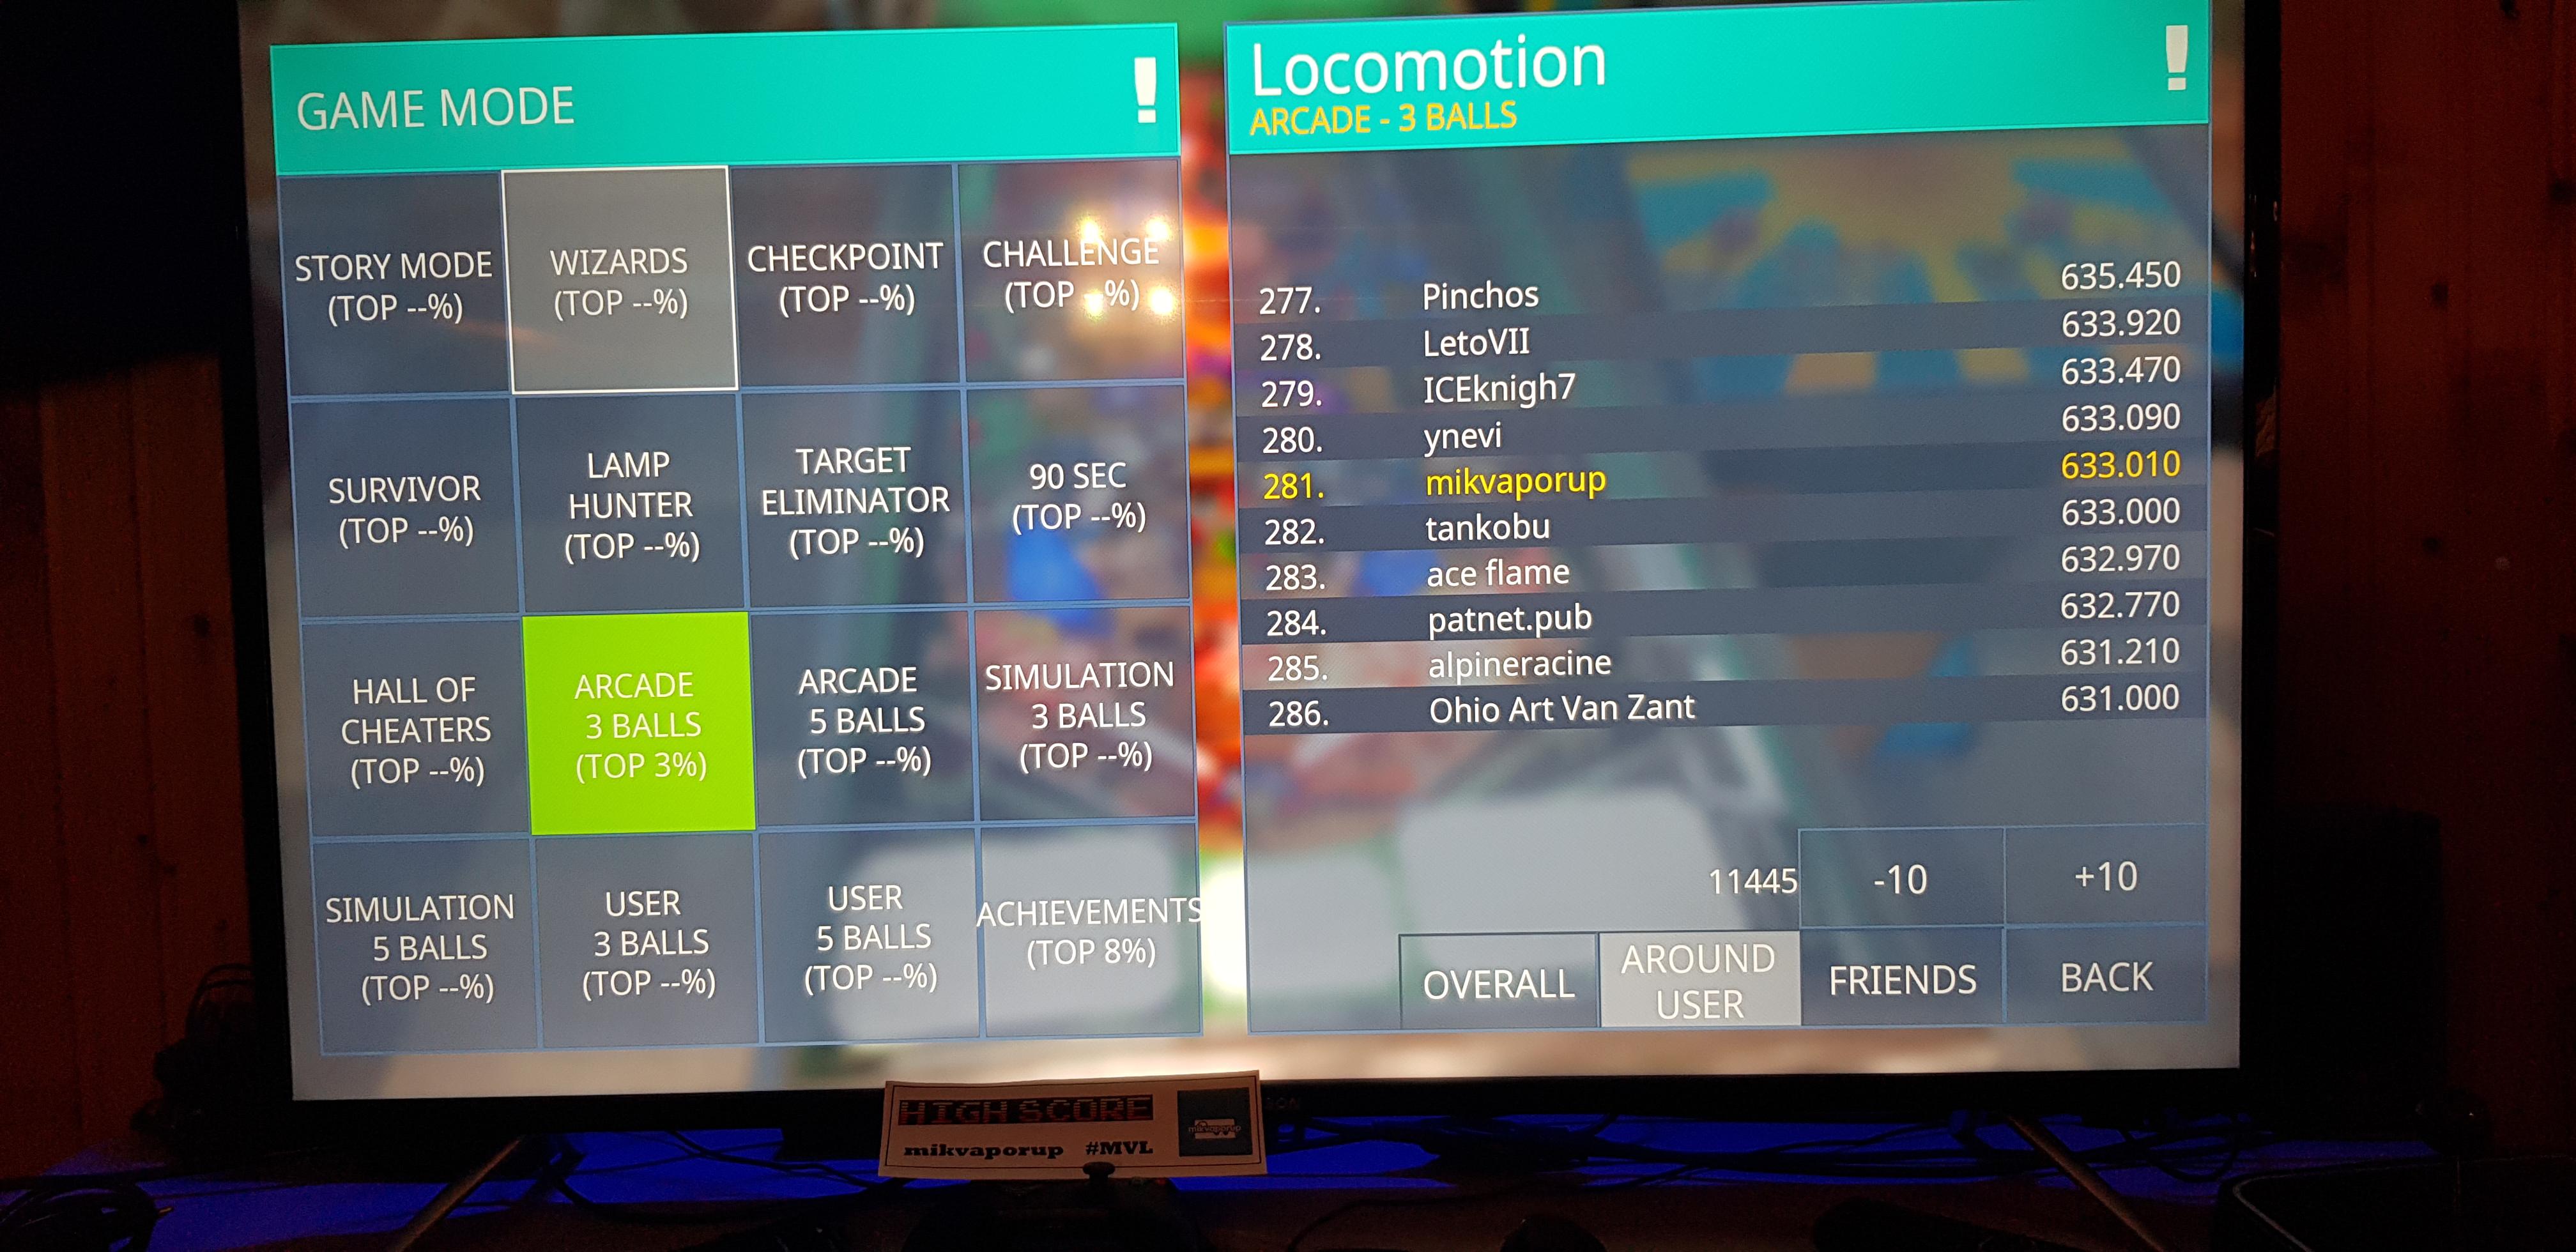 mikvaporup: Zaccaria Pinball: Locomotion [3 balls] (PC) 633,010 points on 2019-11-10 02:45:07